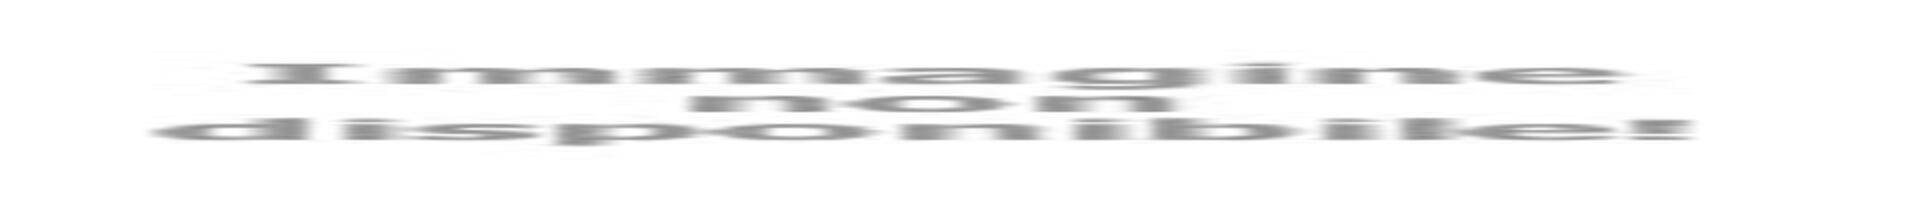 blumenhotel fr special-aout-a-l-hotel-3-etoiles-a-viserba-au-bord-de-la-mer 016